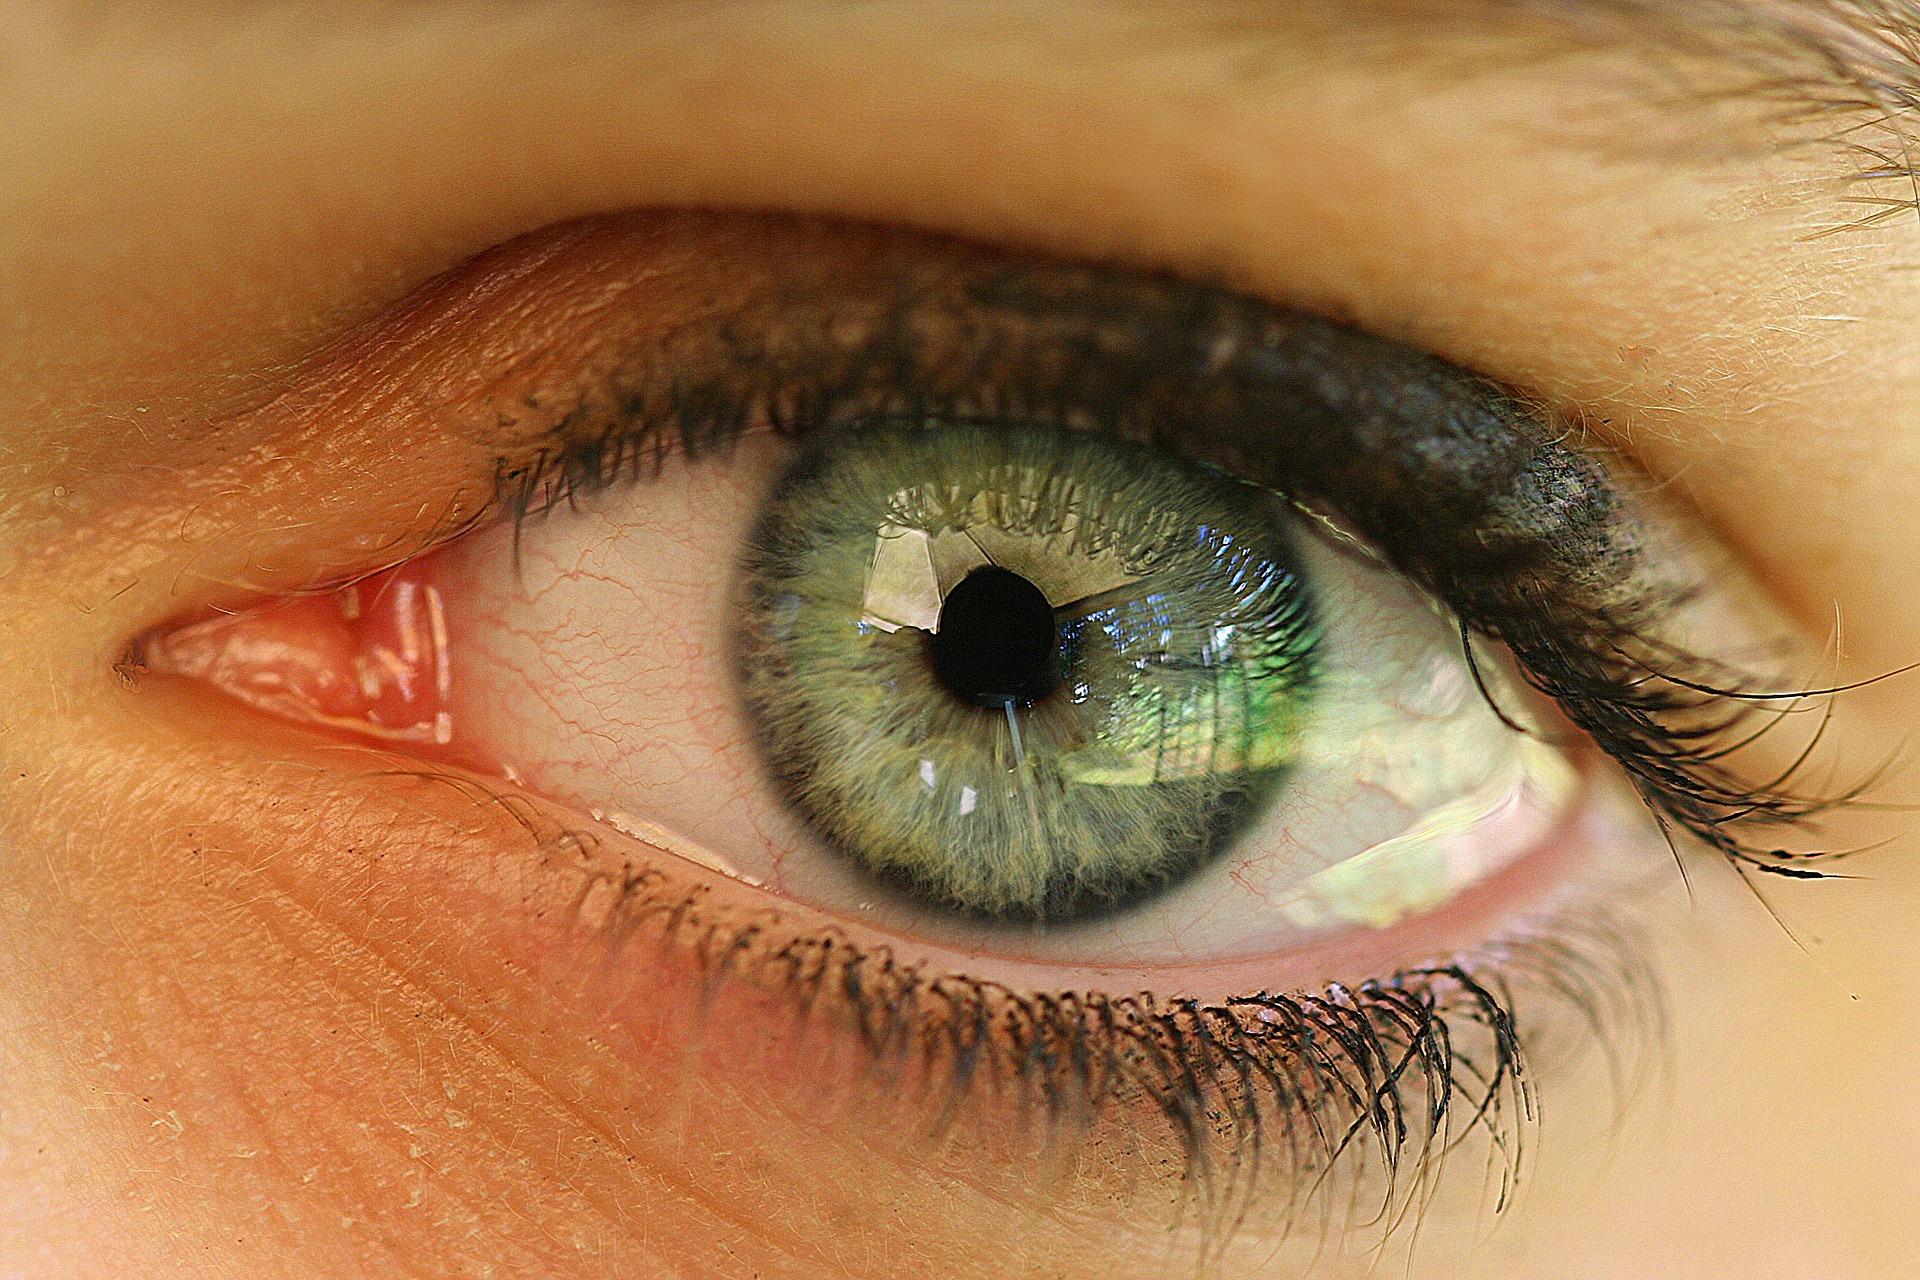 reducere la examenele oculare